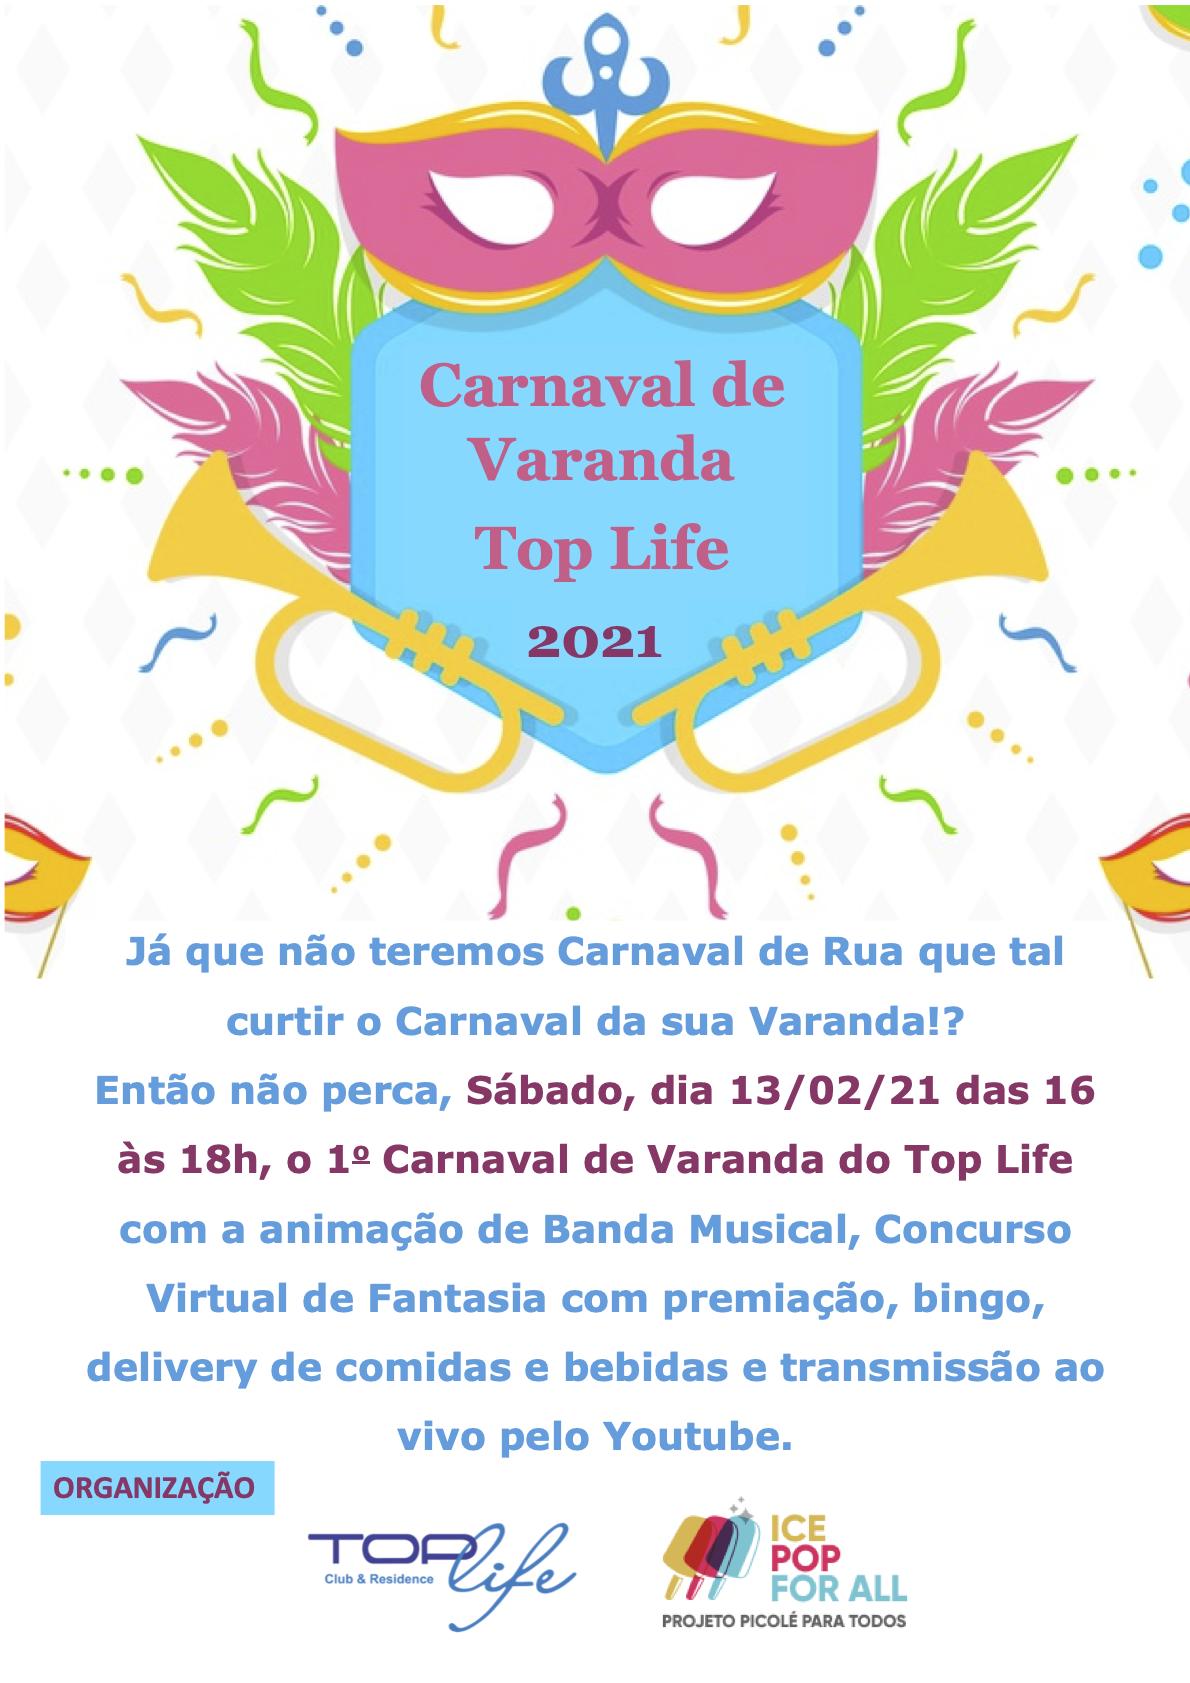 Carnaval de Varanda Top Life 2021